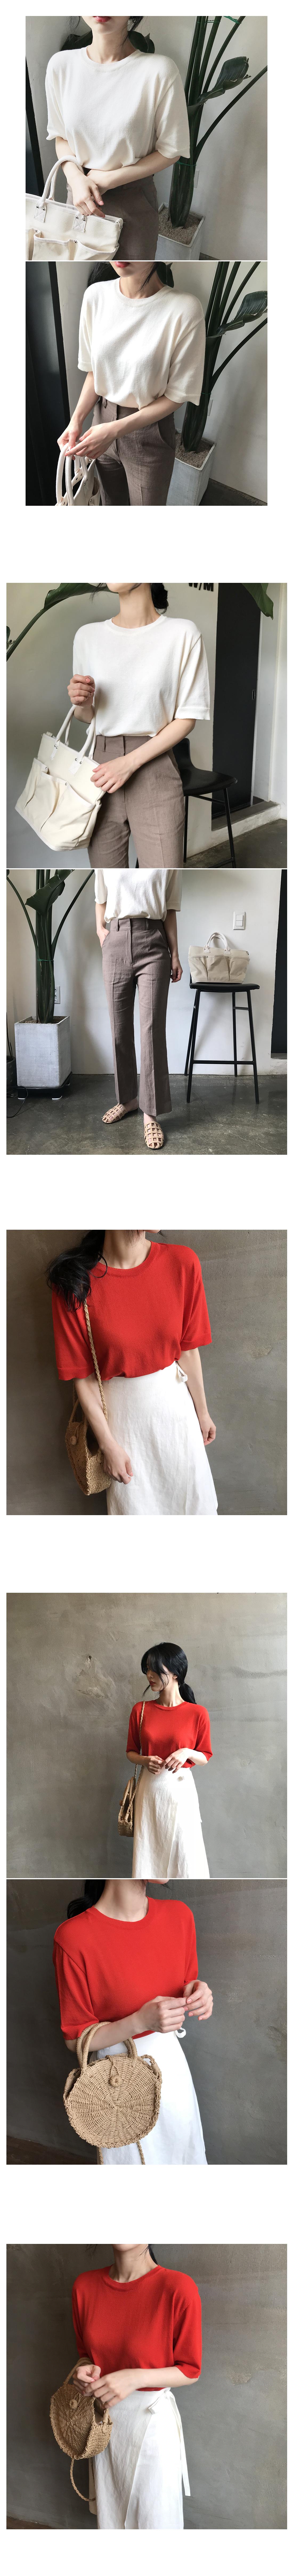 Vanilla Summer Short Sleeve Knit - Red ships same day